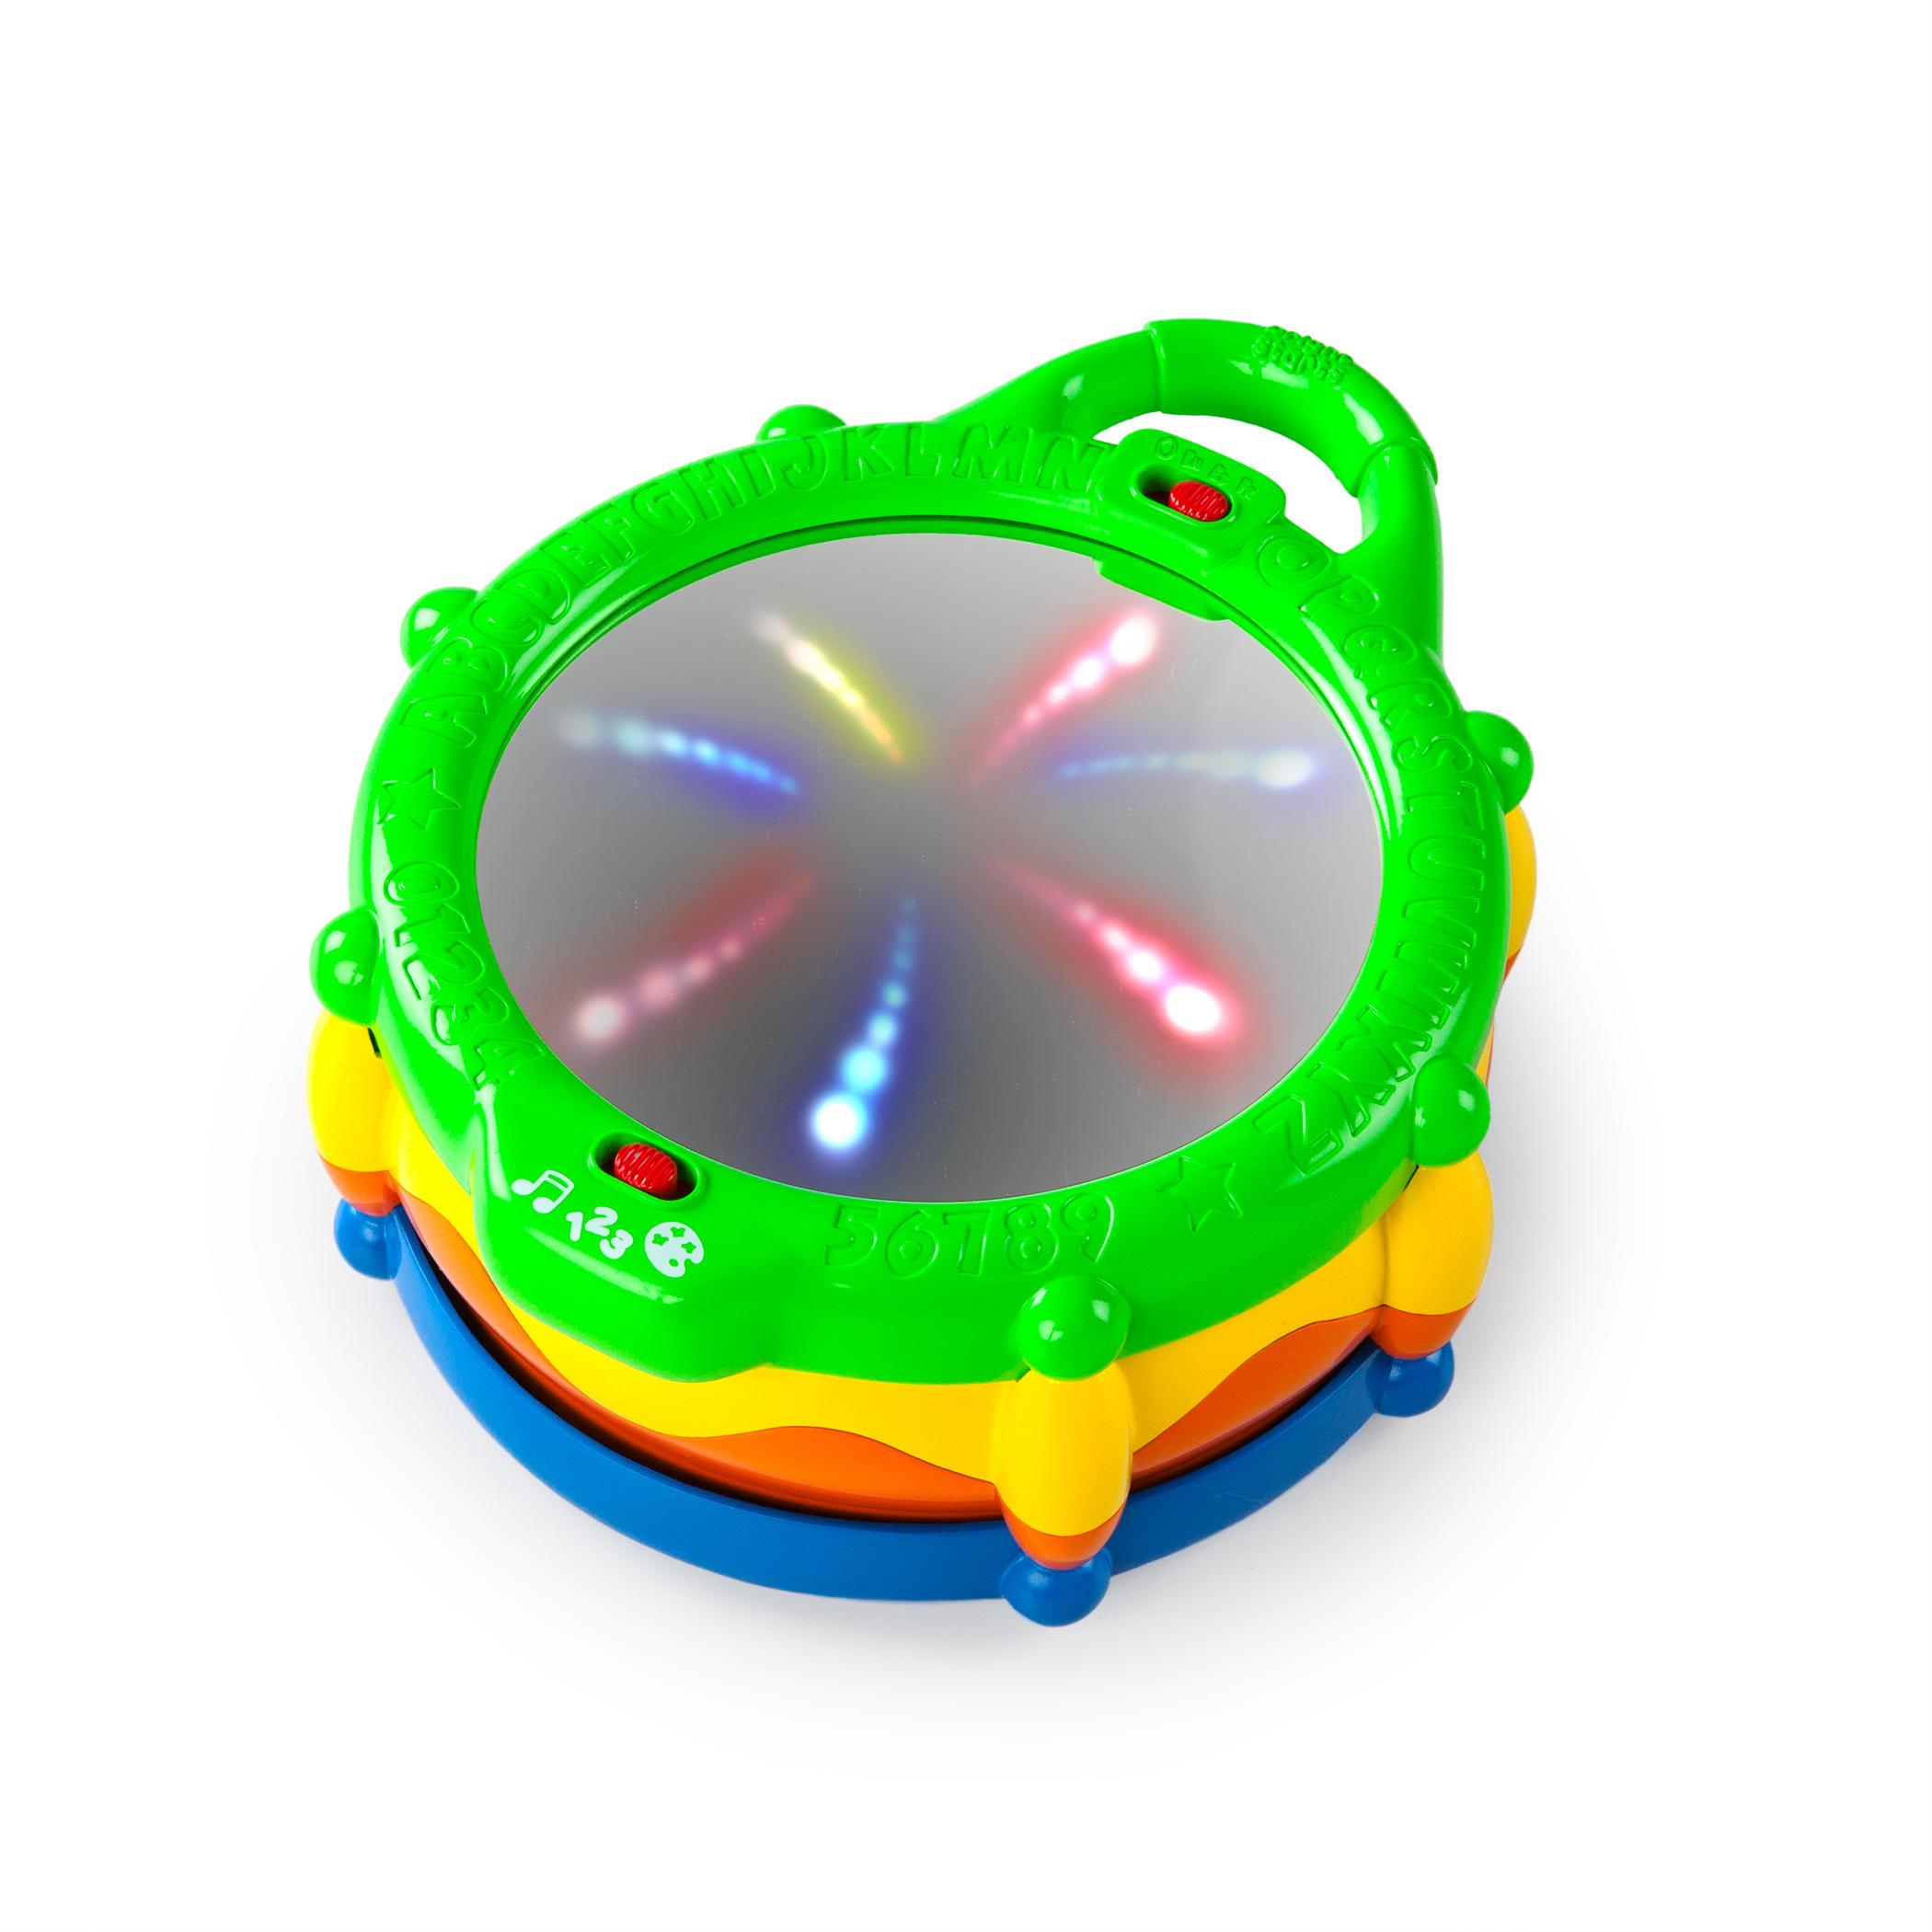 Light & Learn Drum™